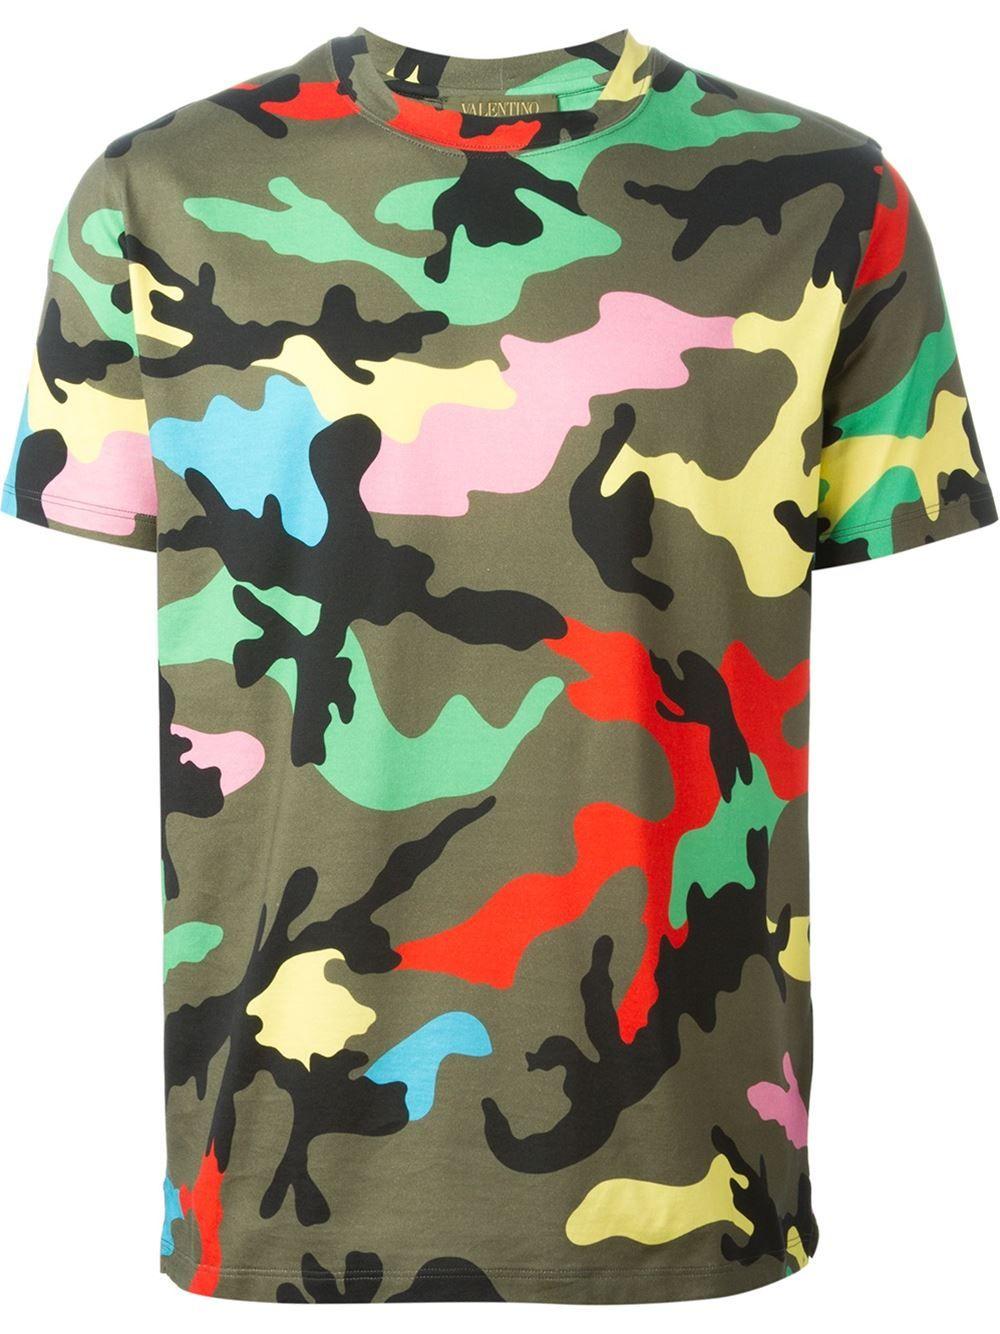 e84b7dc36e0f4 Valentino 'rockstud' Camouflage T-shirt - Julian Fashion - Farfetch ...